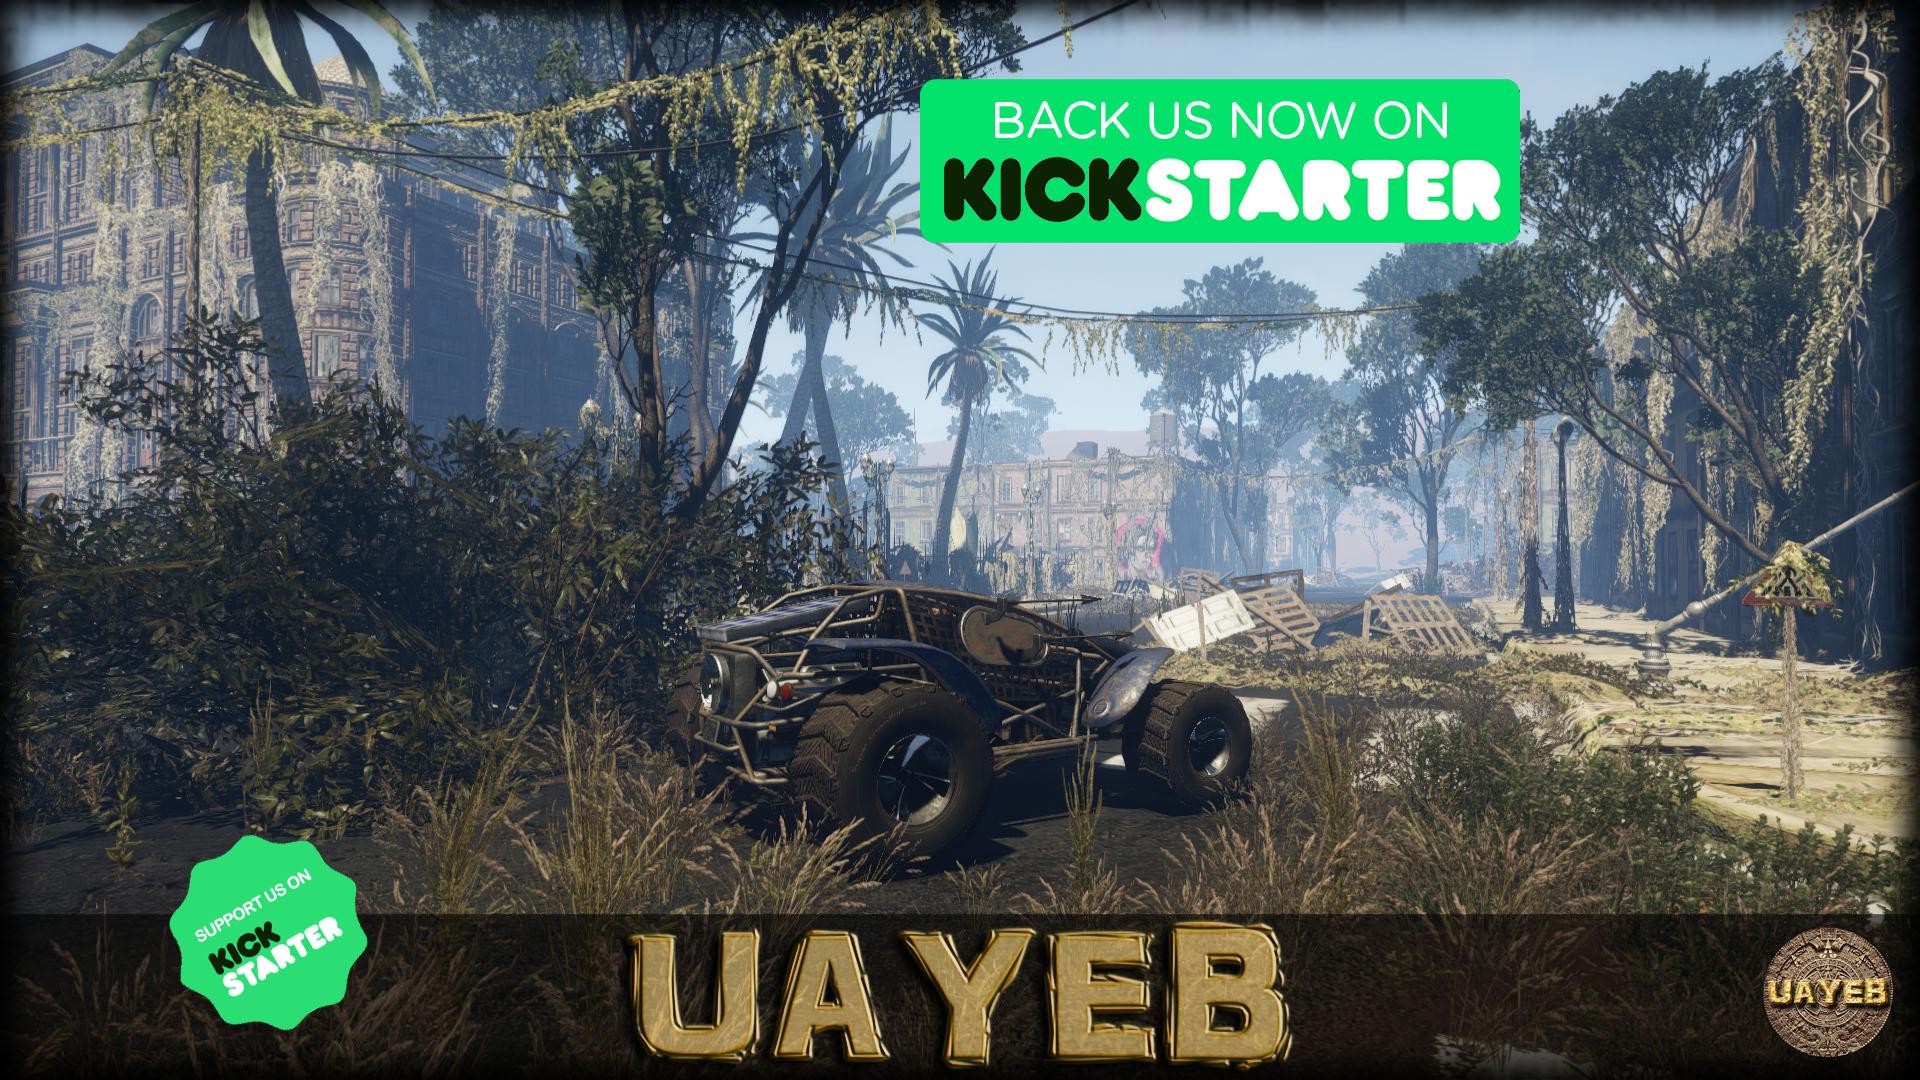 Uayeb Kickstarter